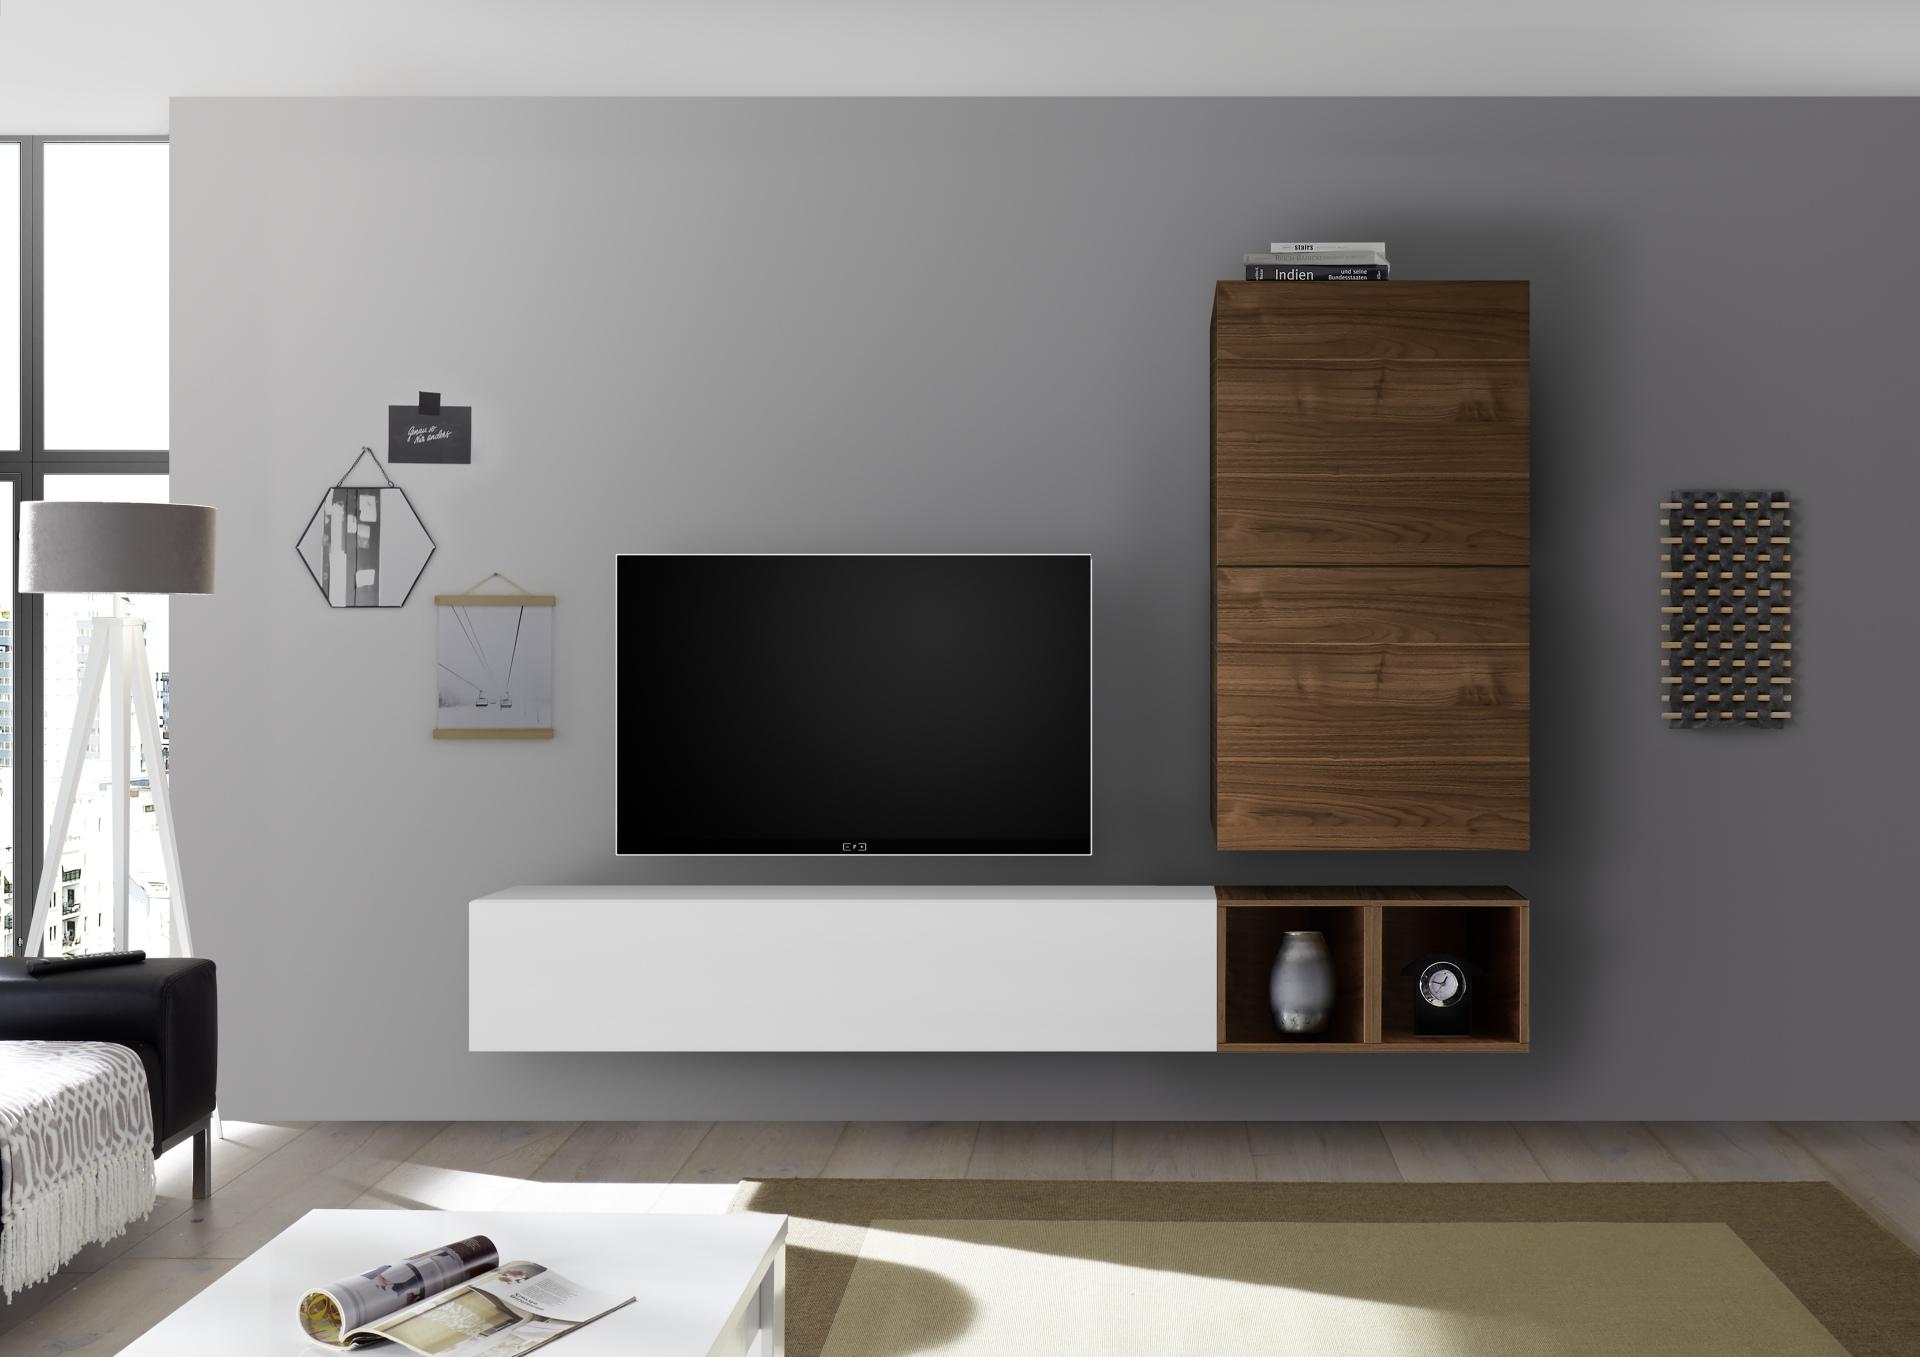 Tv Meubel Wit Noten.Moderne Zwevende Wandcombinatie Kopen Aktiewonen Nl